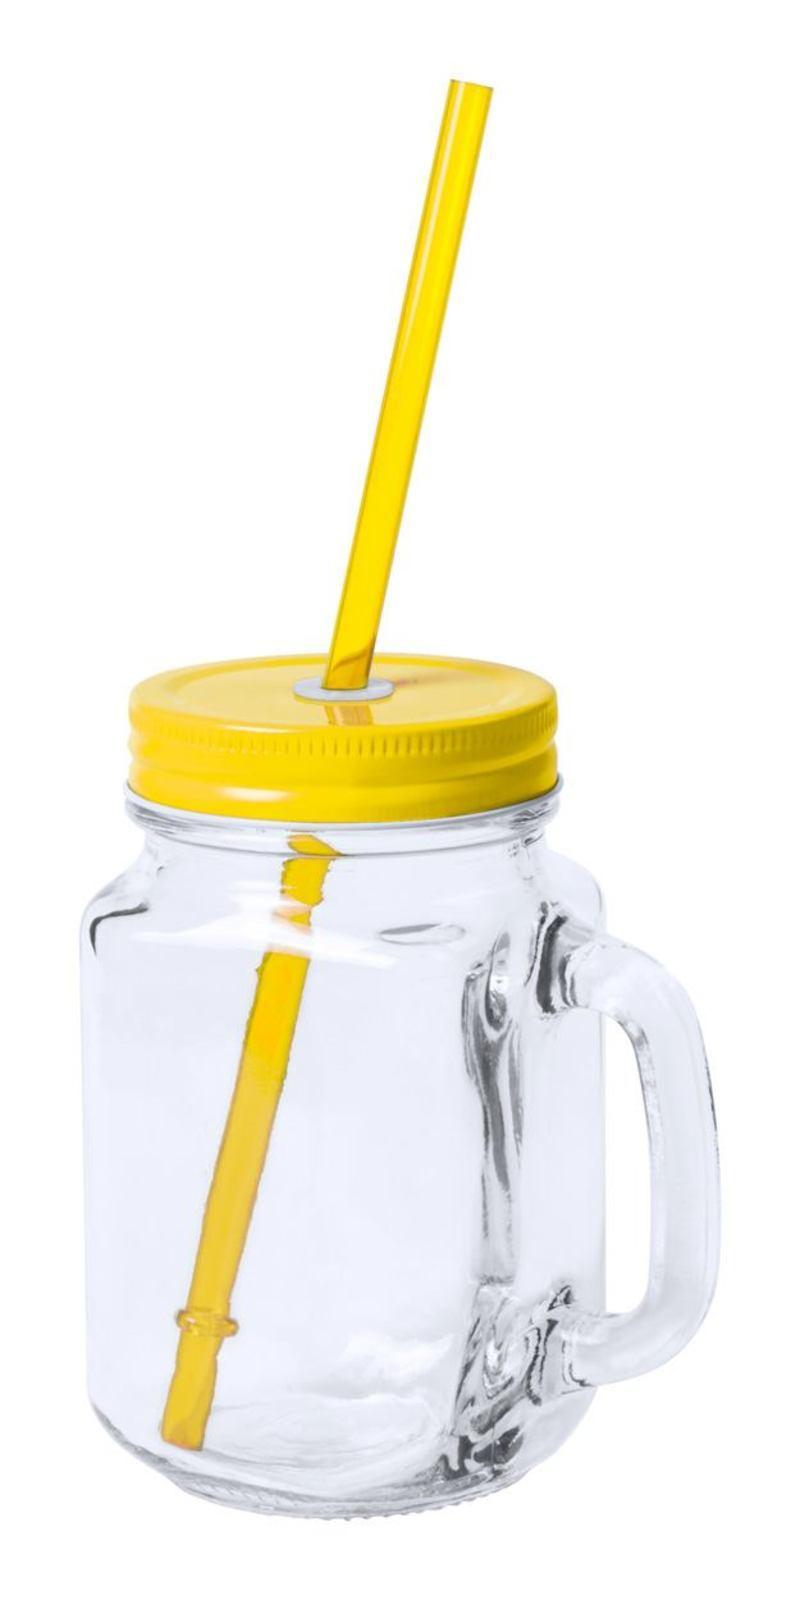 Heisond jar